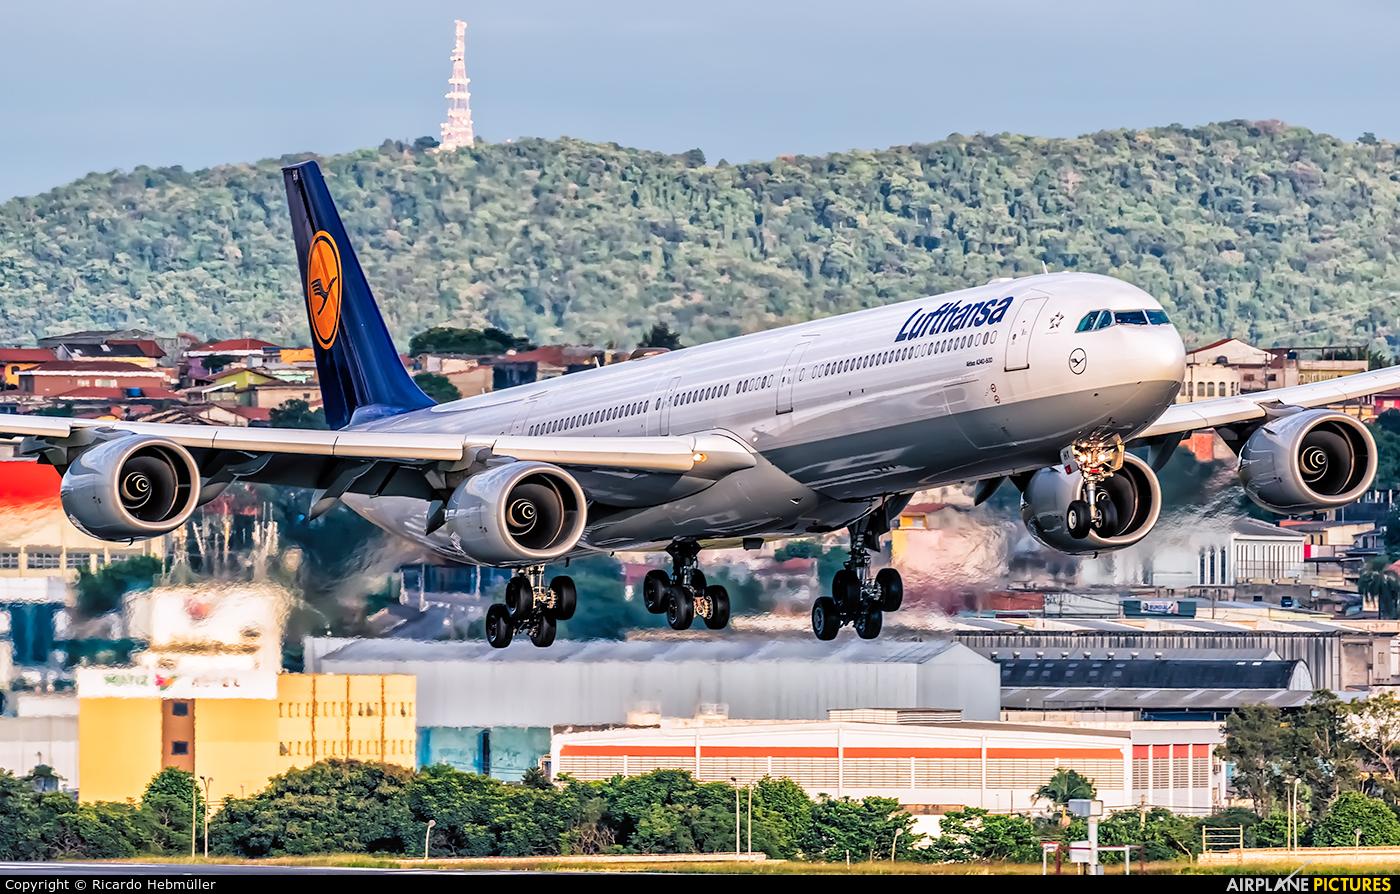 Lufthansa D-AIHY aircraft at São Paulo - Guarulhos